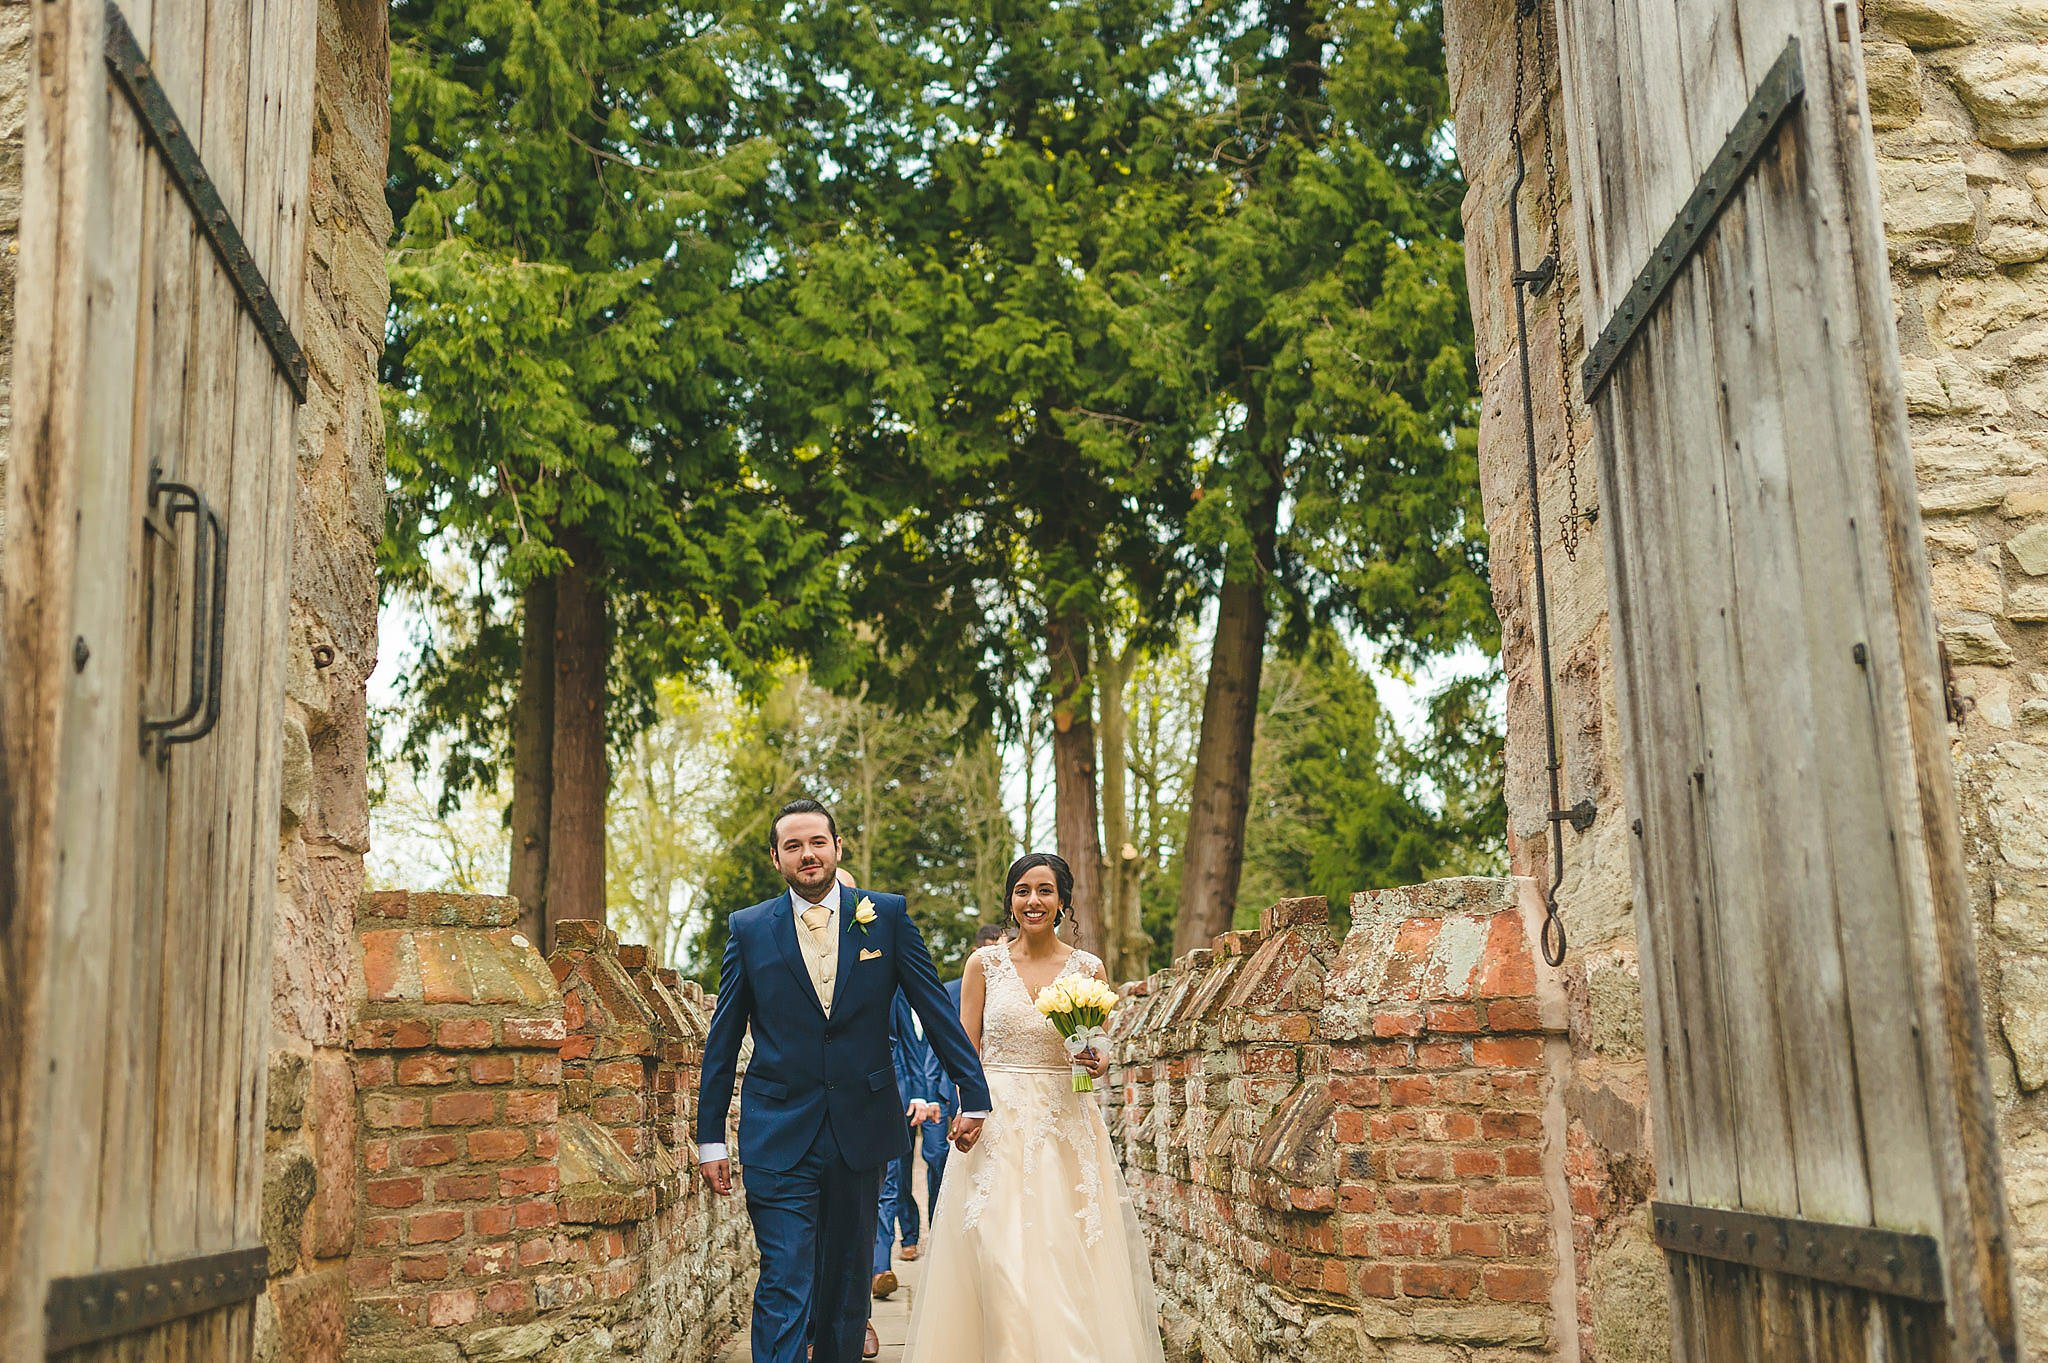 Sheena + Lee | Birtsmorton Court Wedding 53